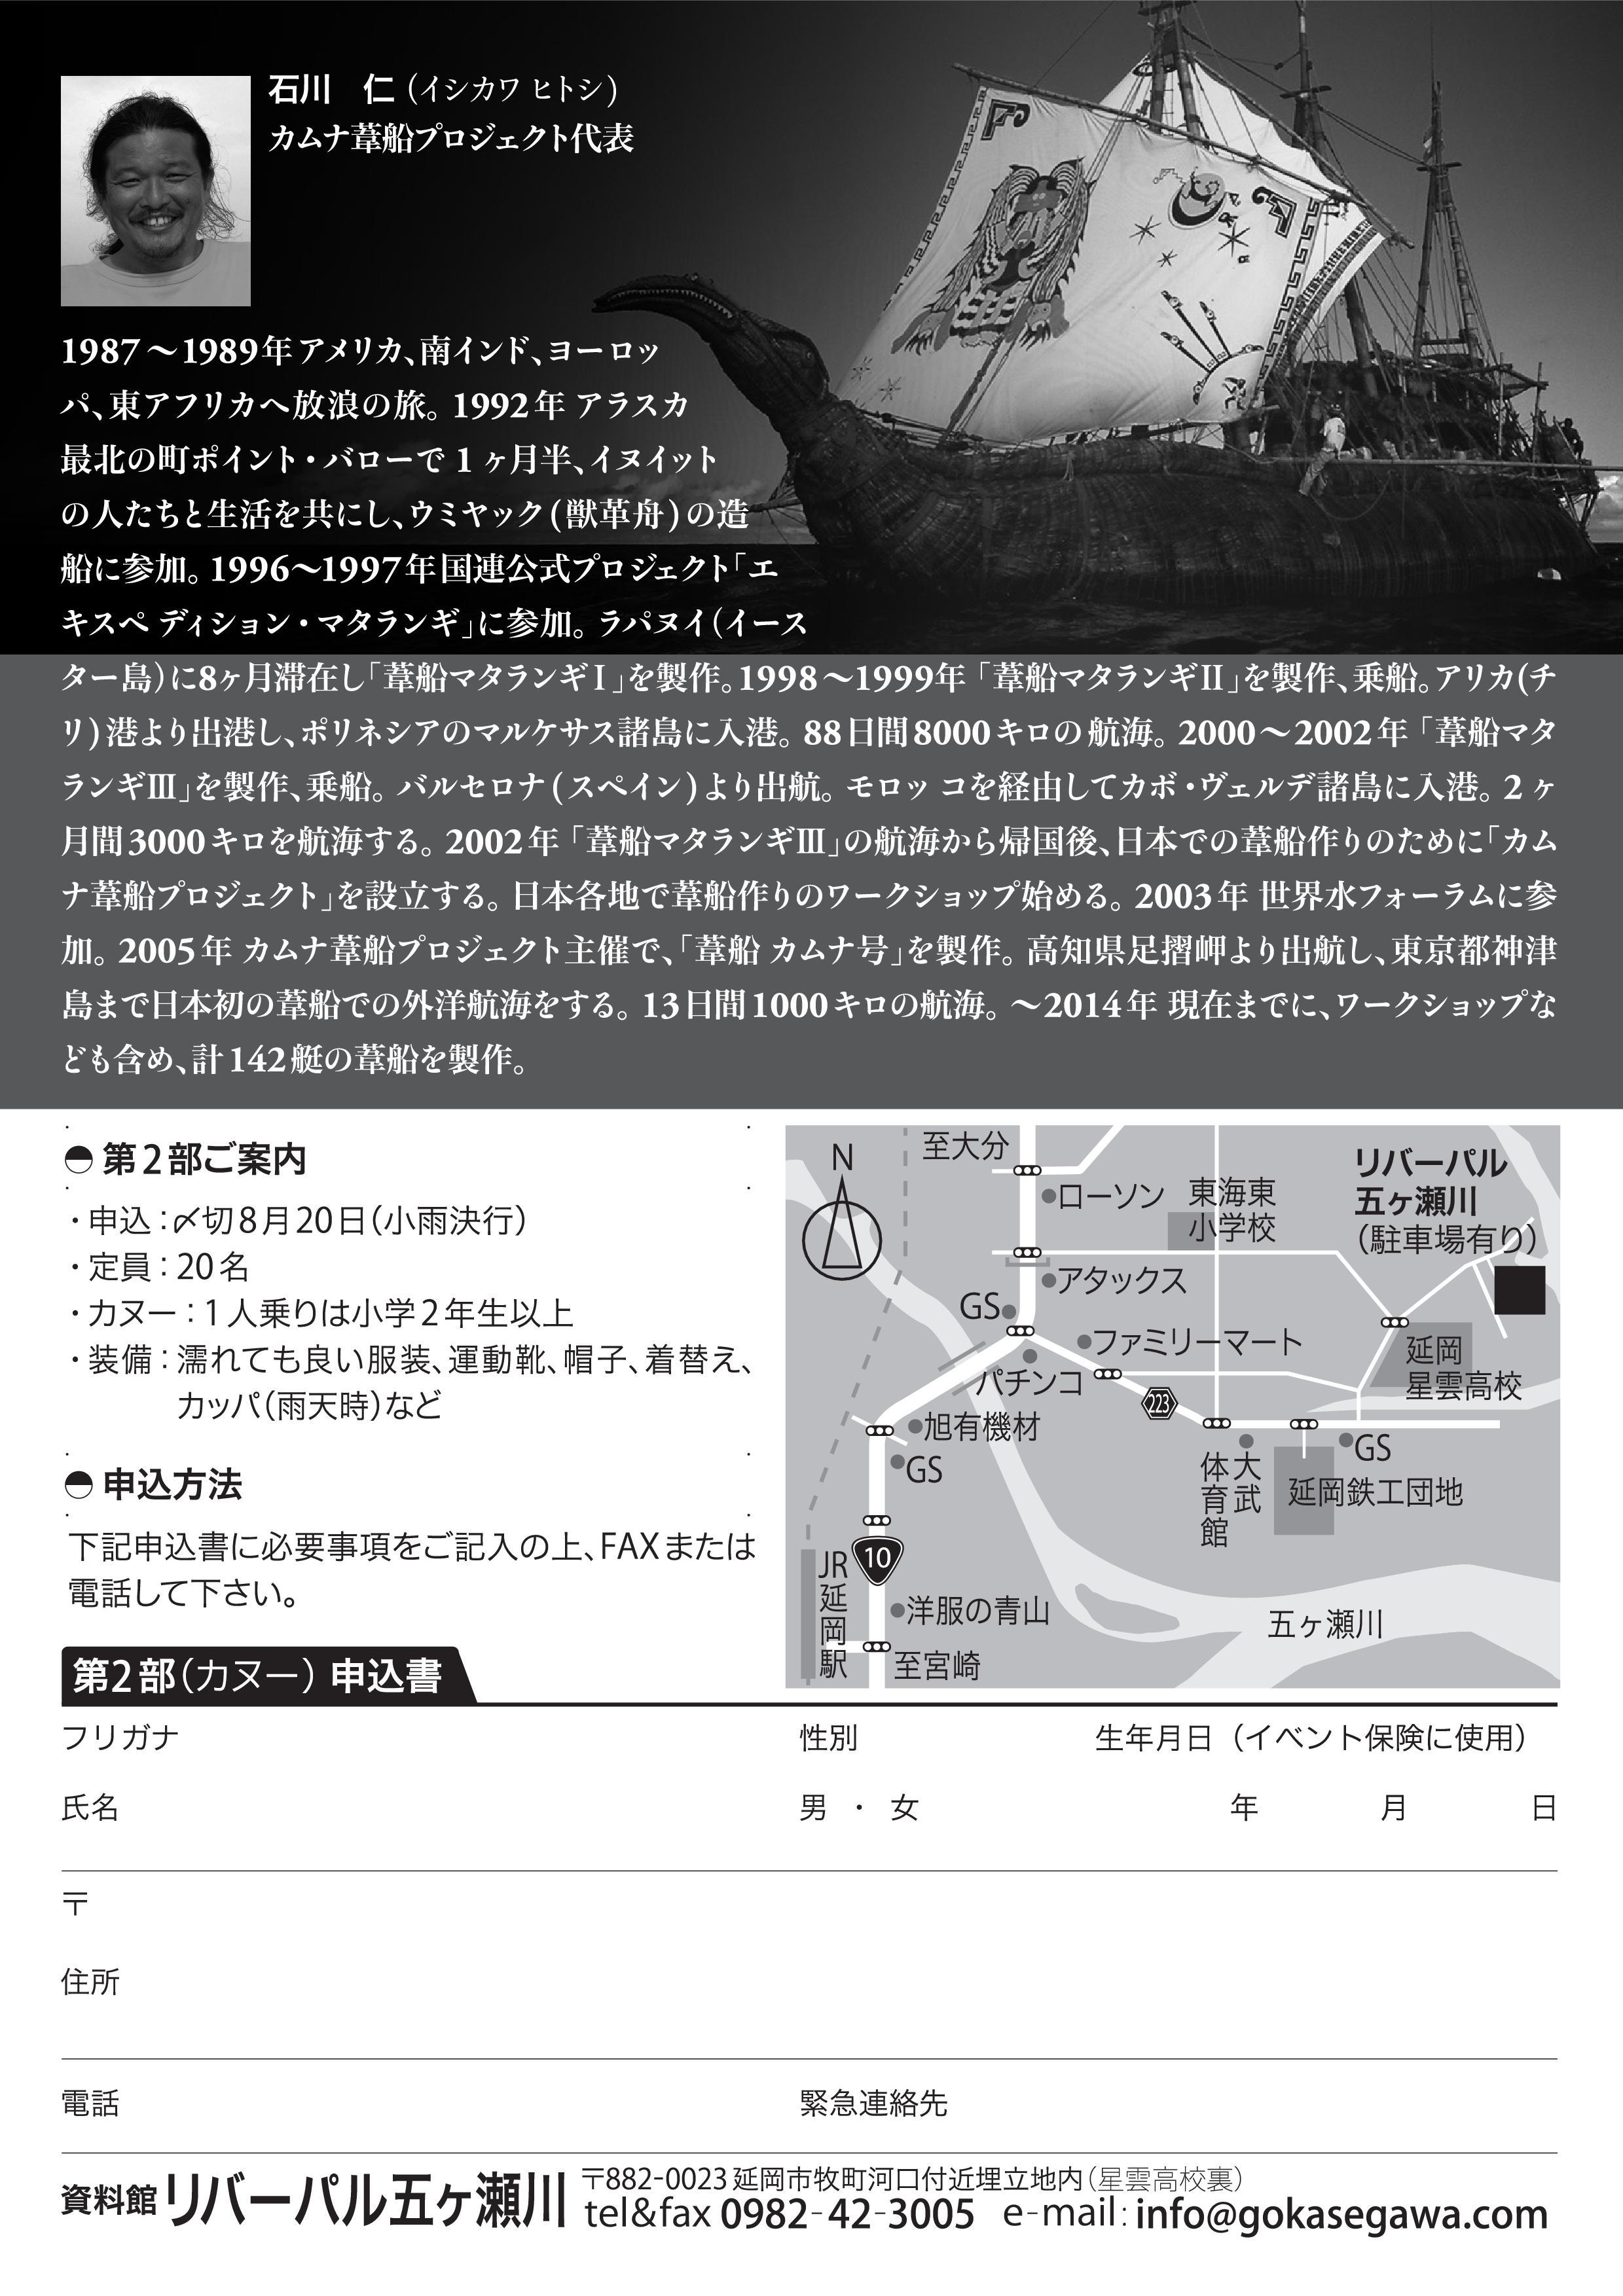 葦船学校@延岡チラシ正規